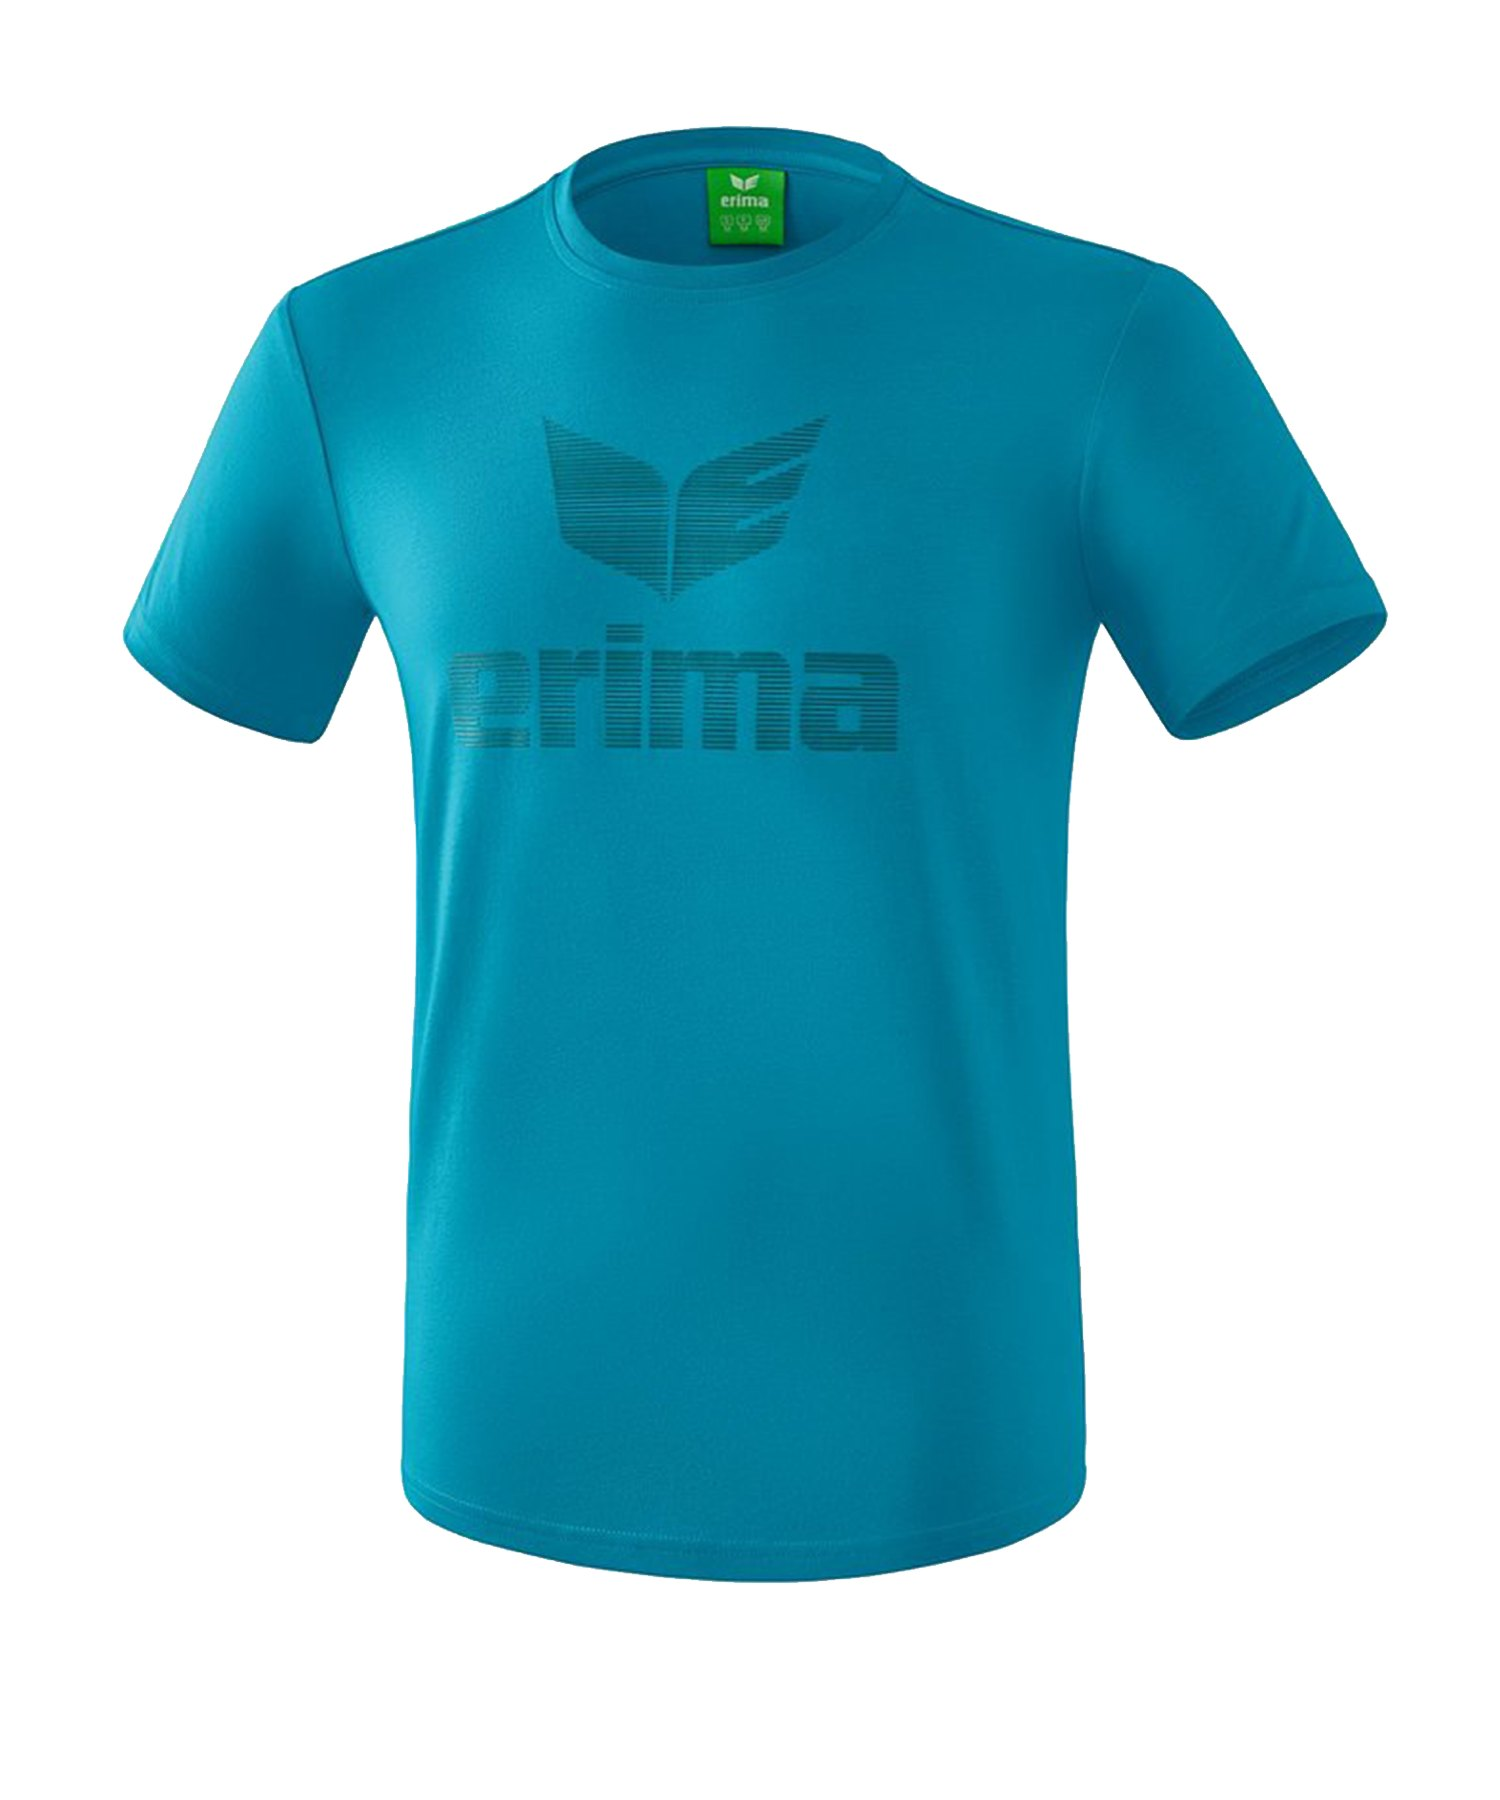 Erima Essential T-Shirt Kids Blau - Blau